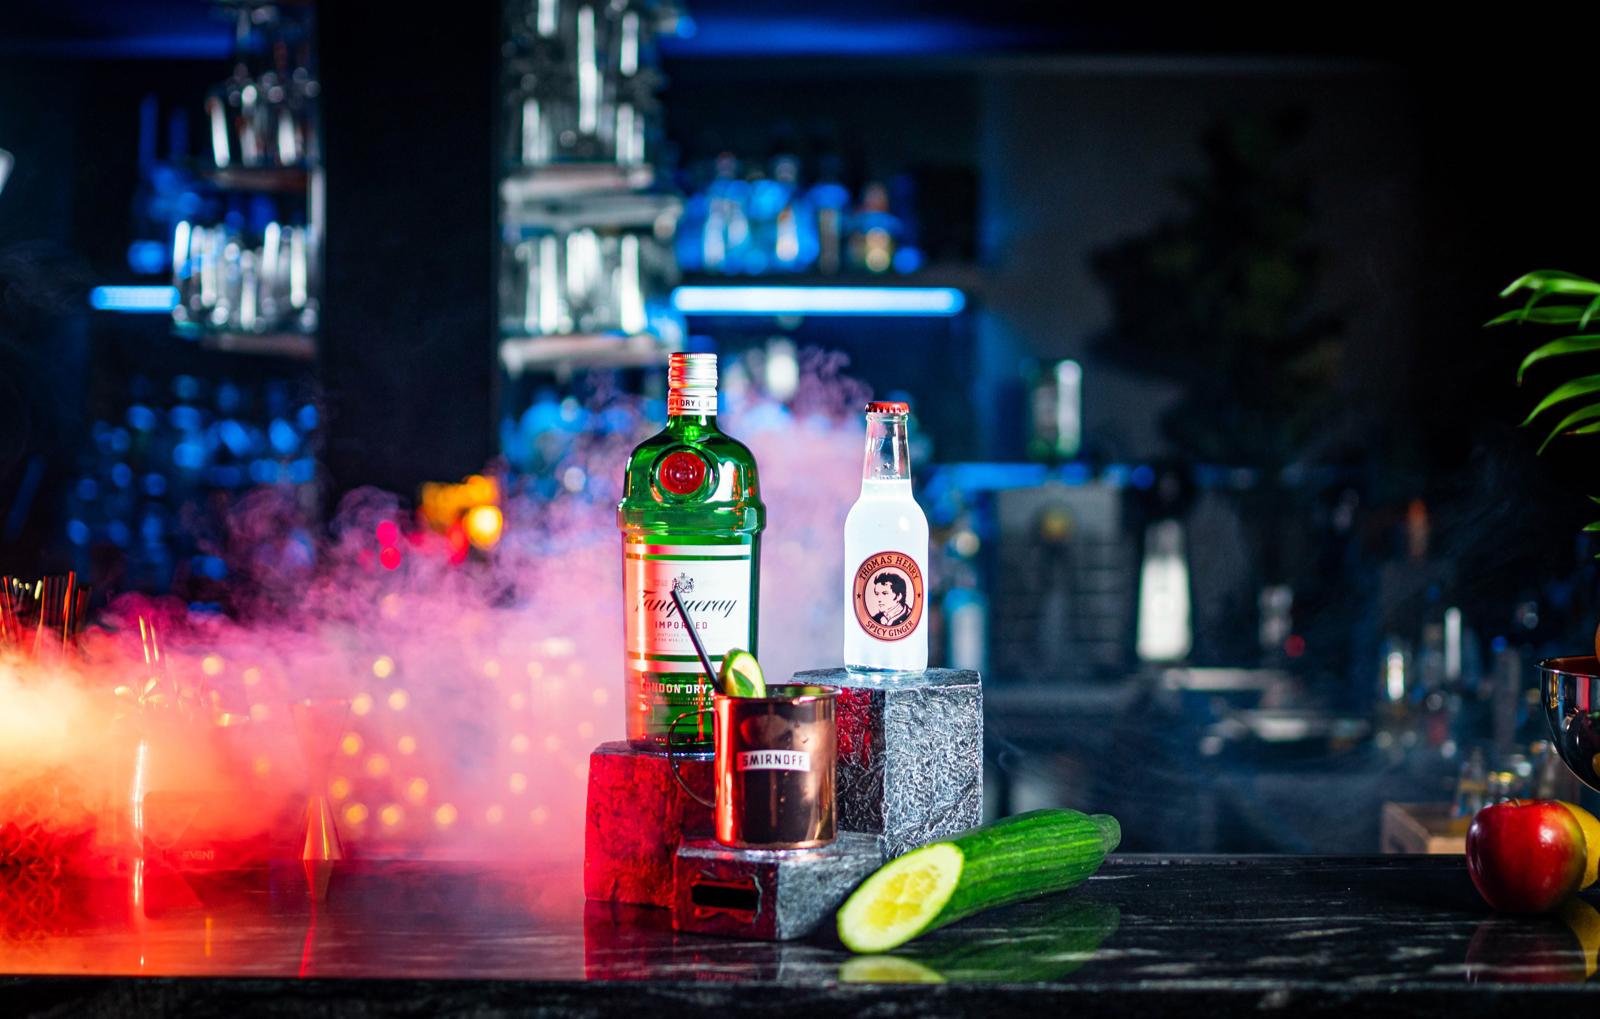 gin-tasting-berlin-bg41626188215